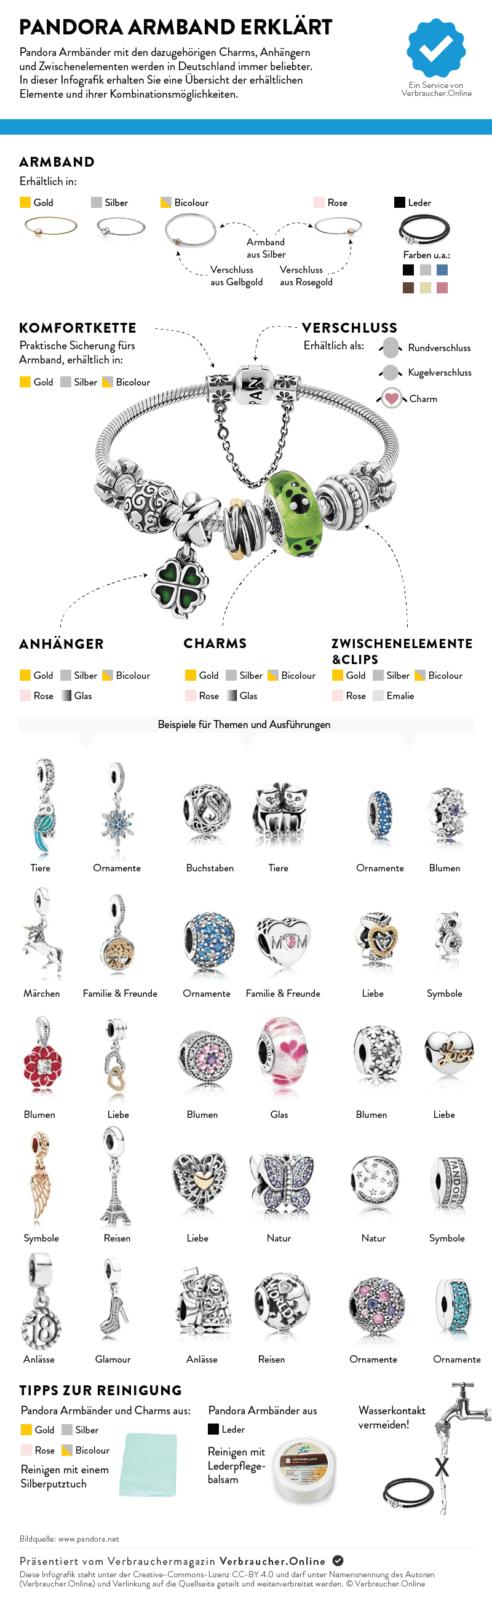 Infografik: Pandora Armband & Charms erklärt